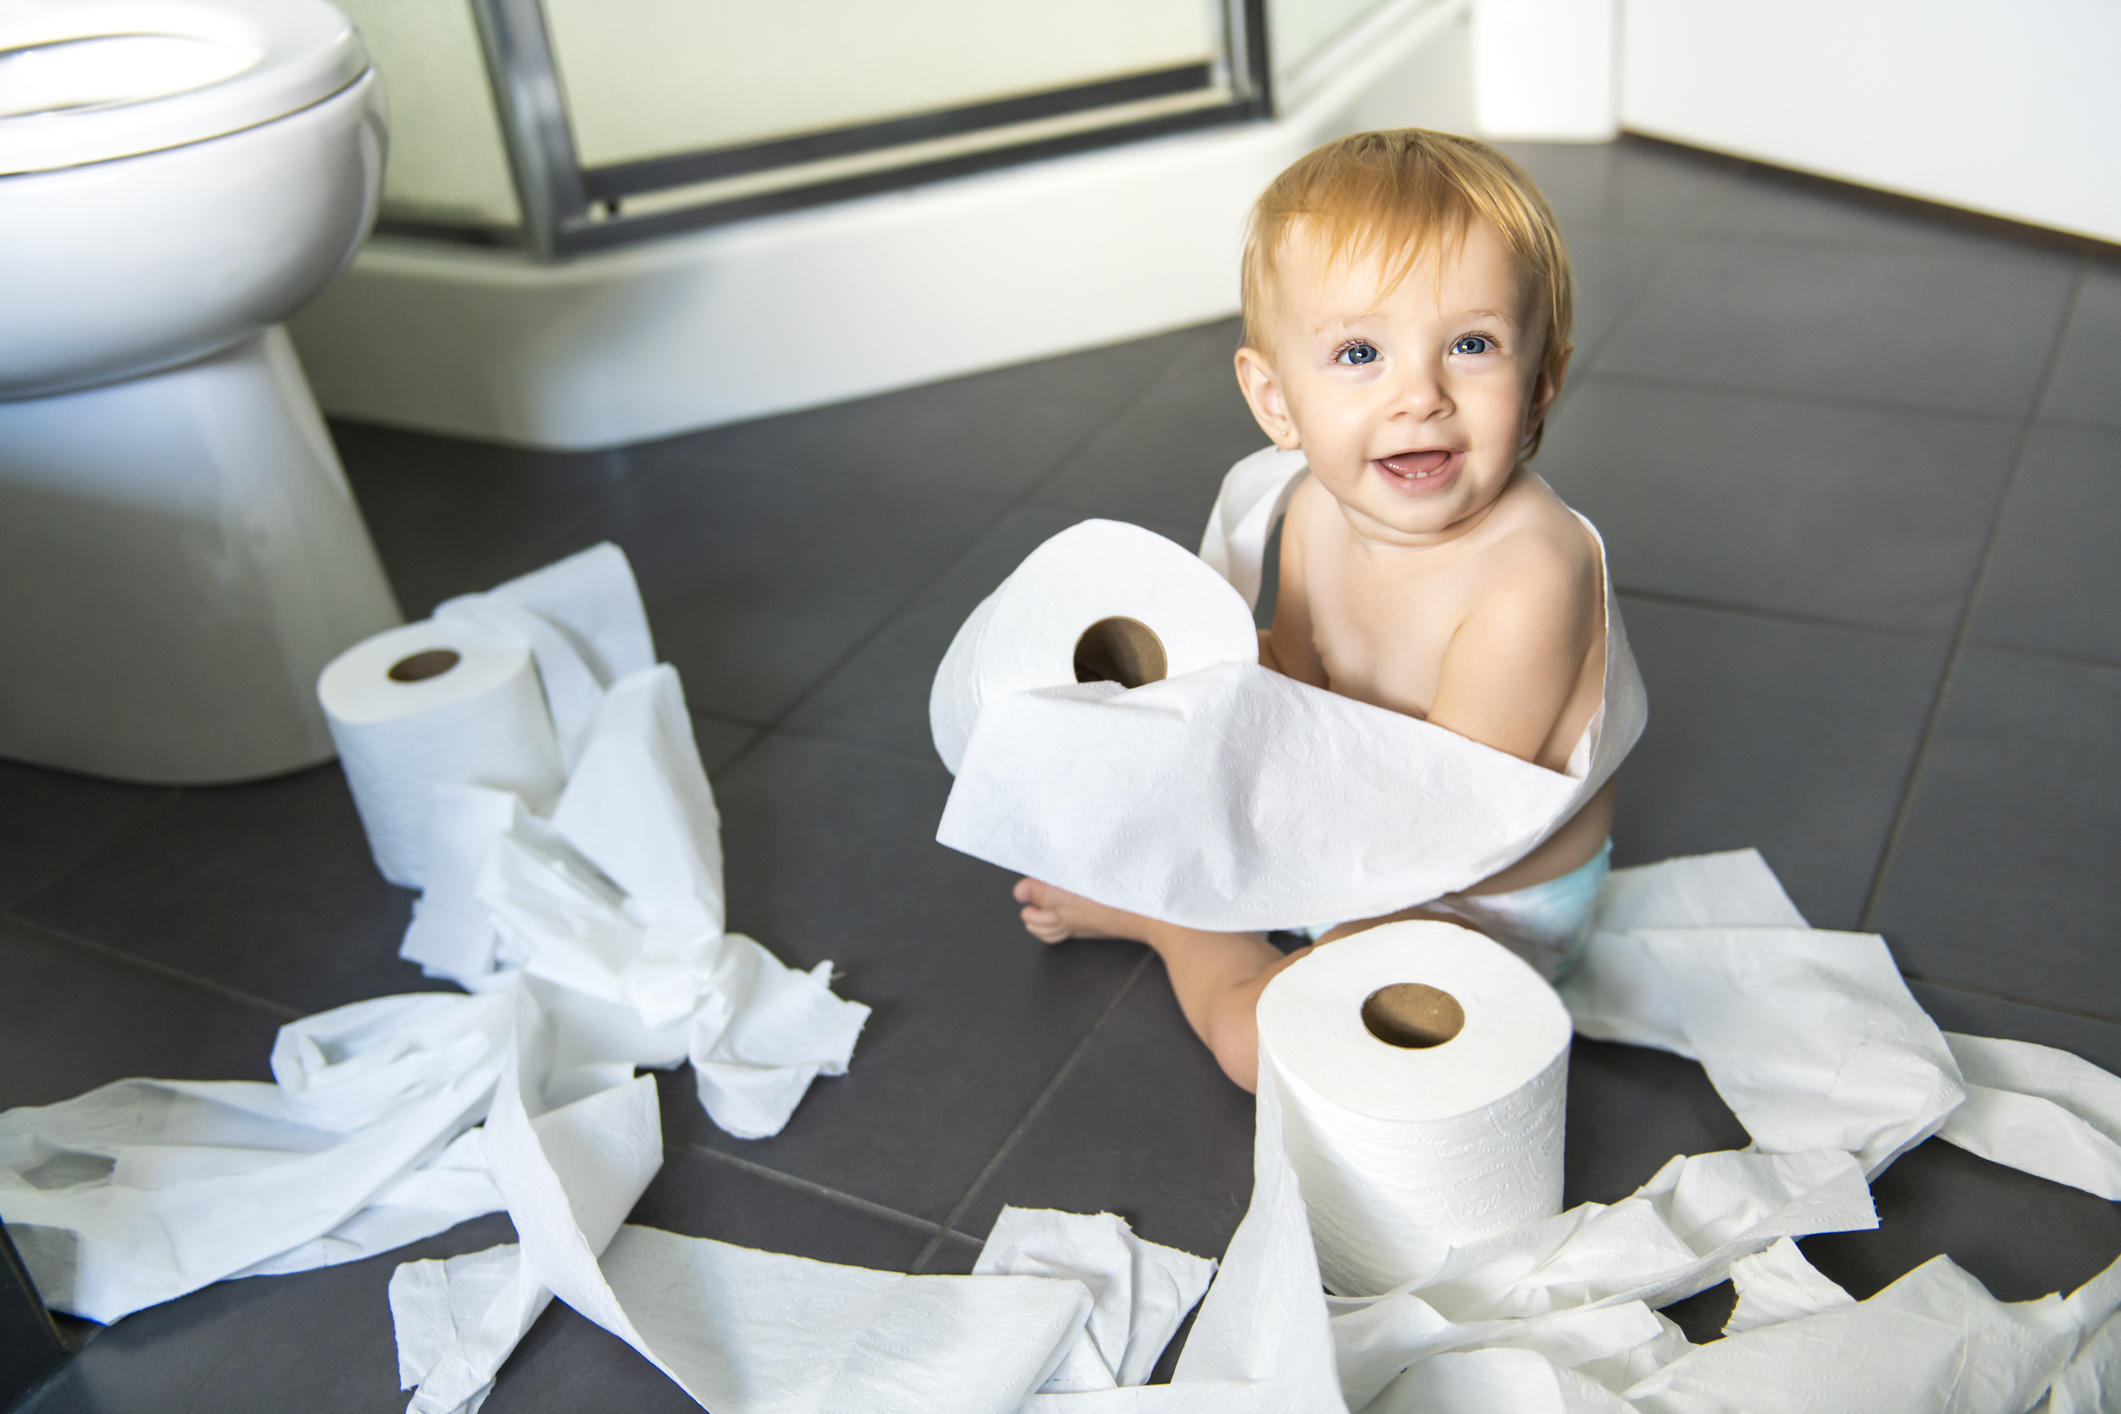 Toilet terrors of the toddler type